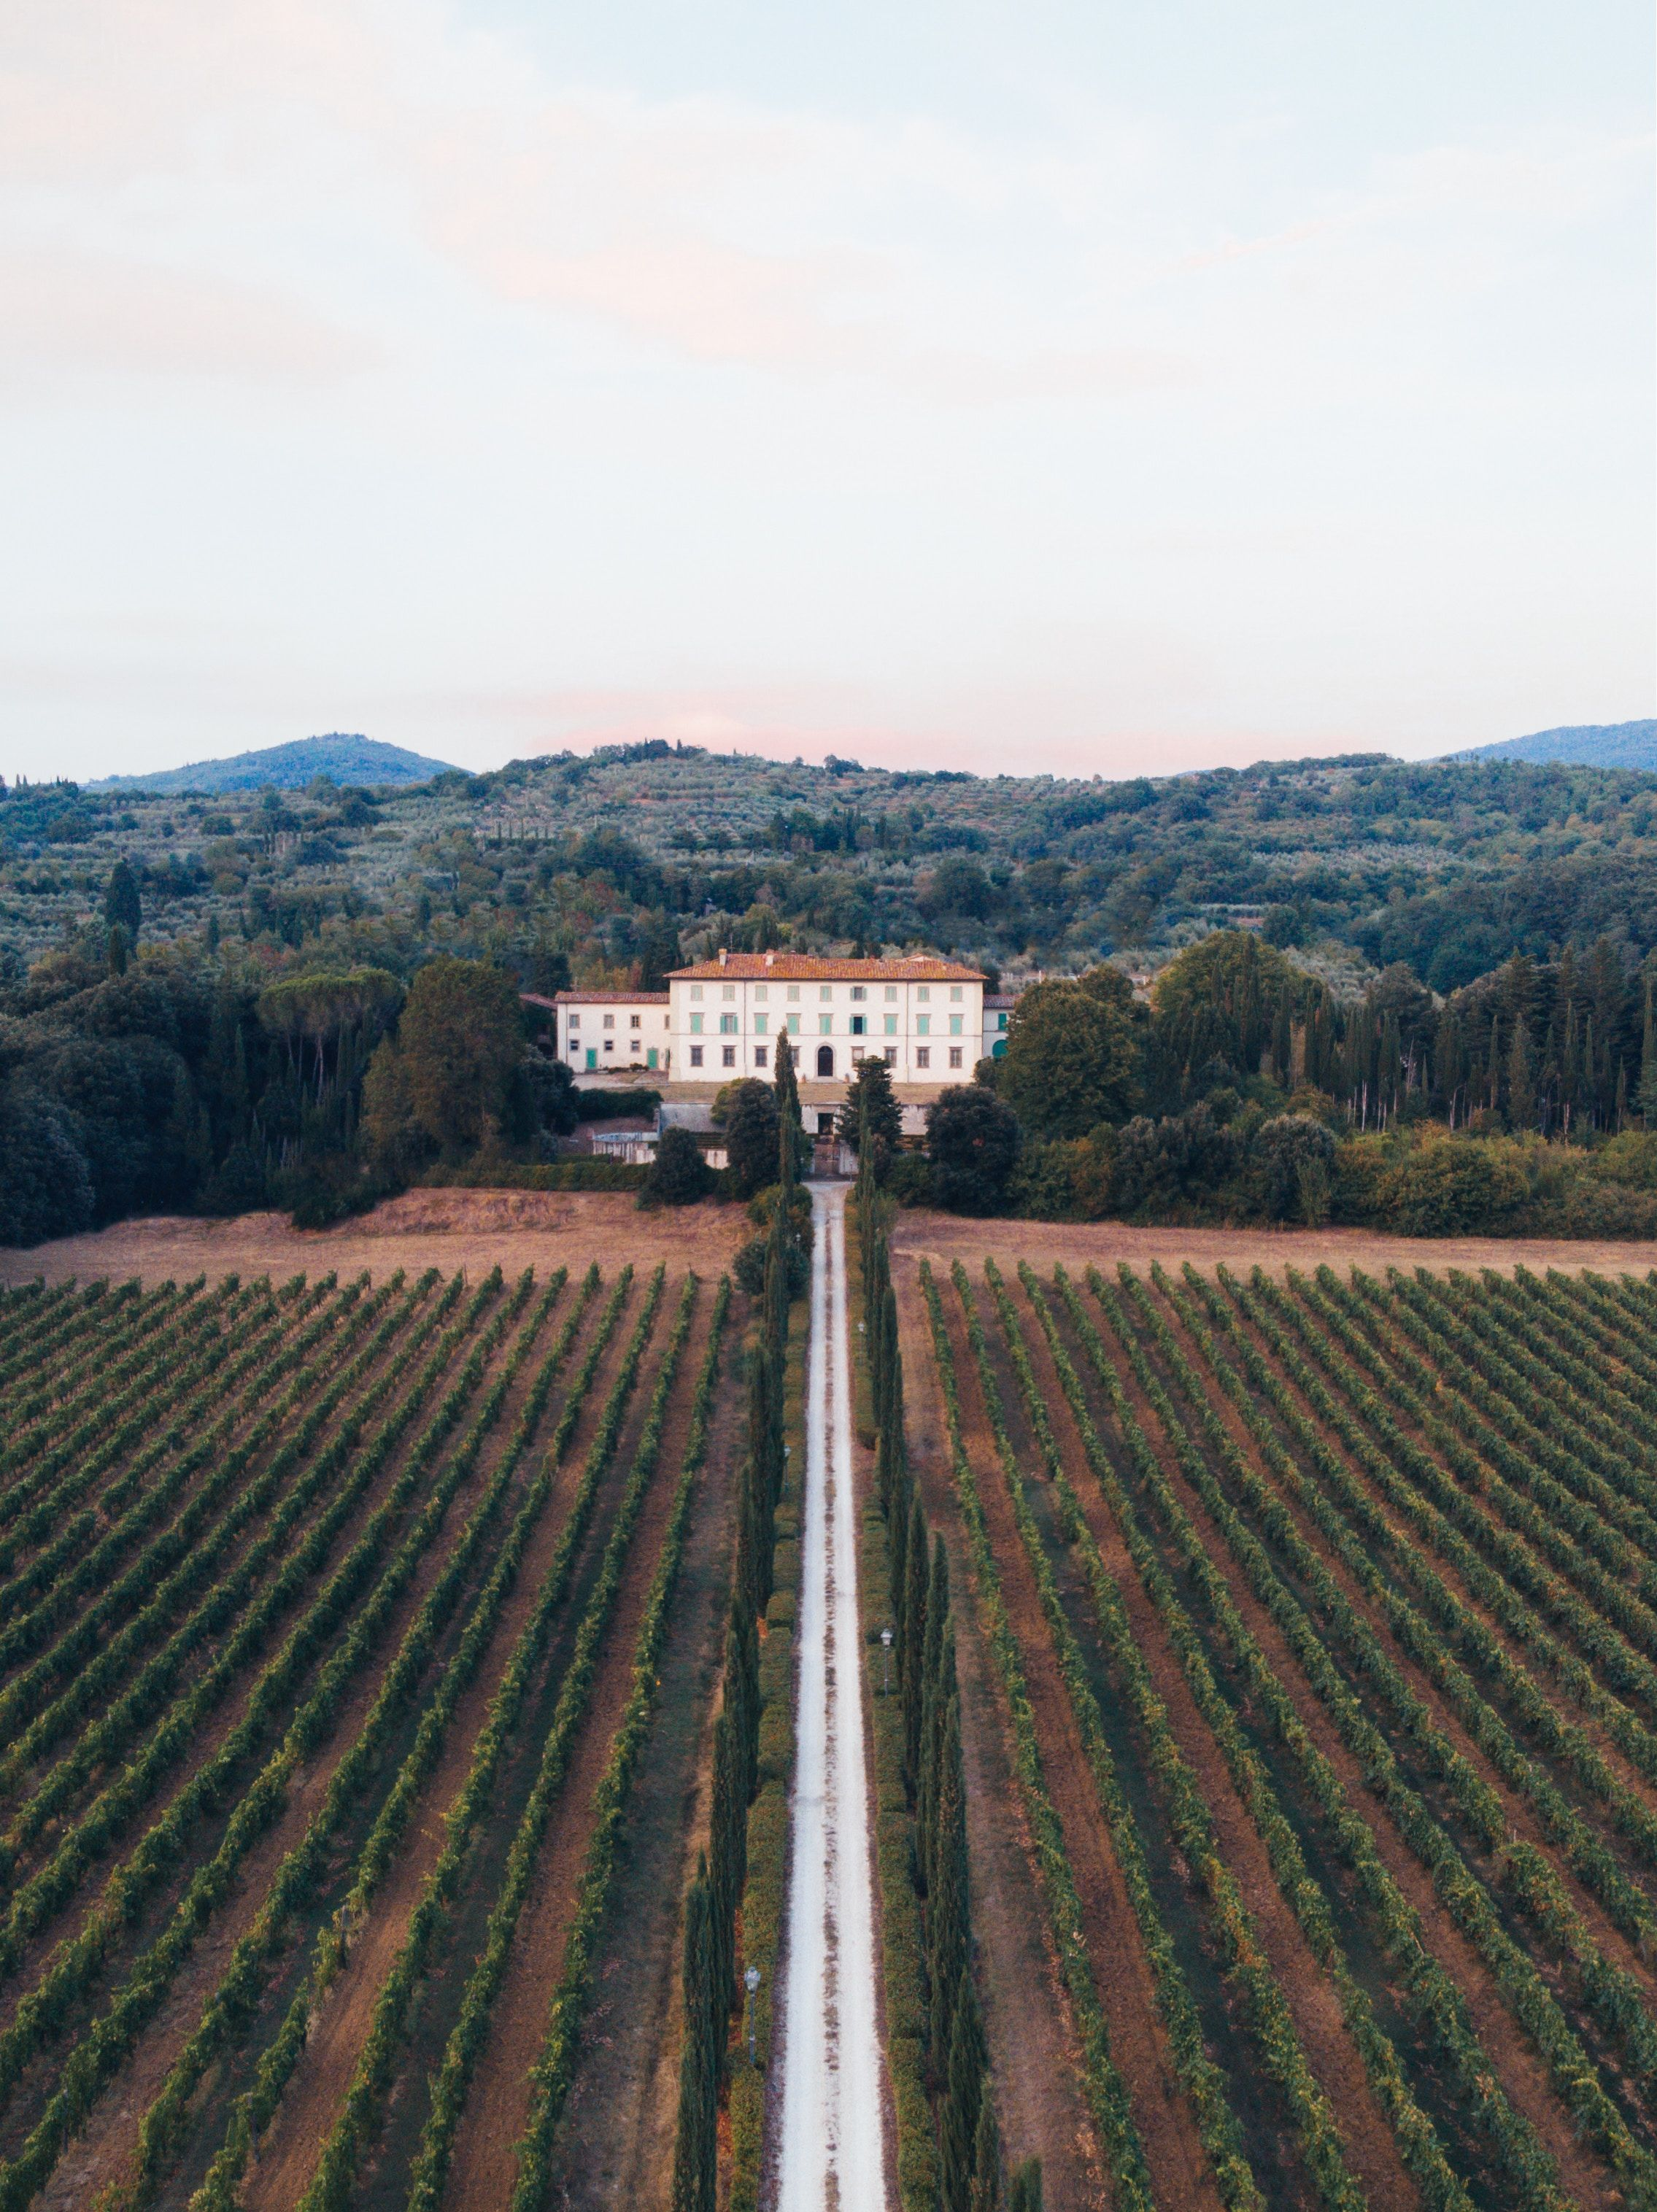 Photo of vineyard fields Tuscany